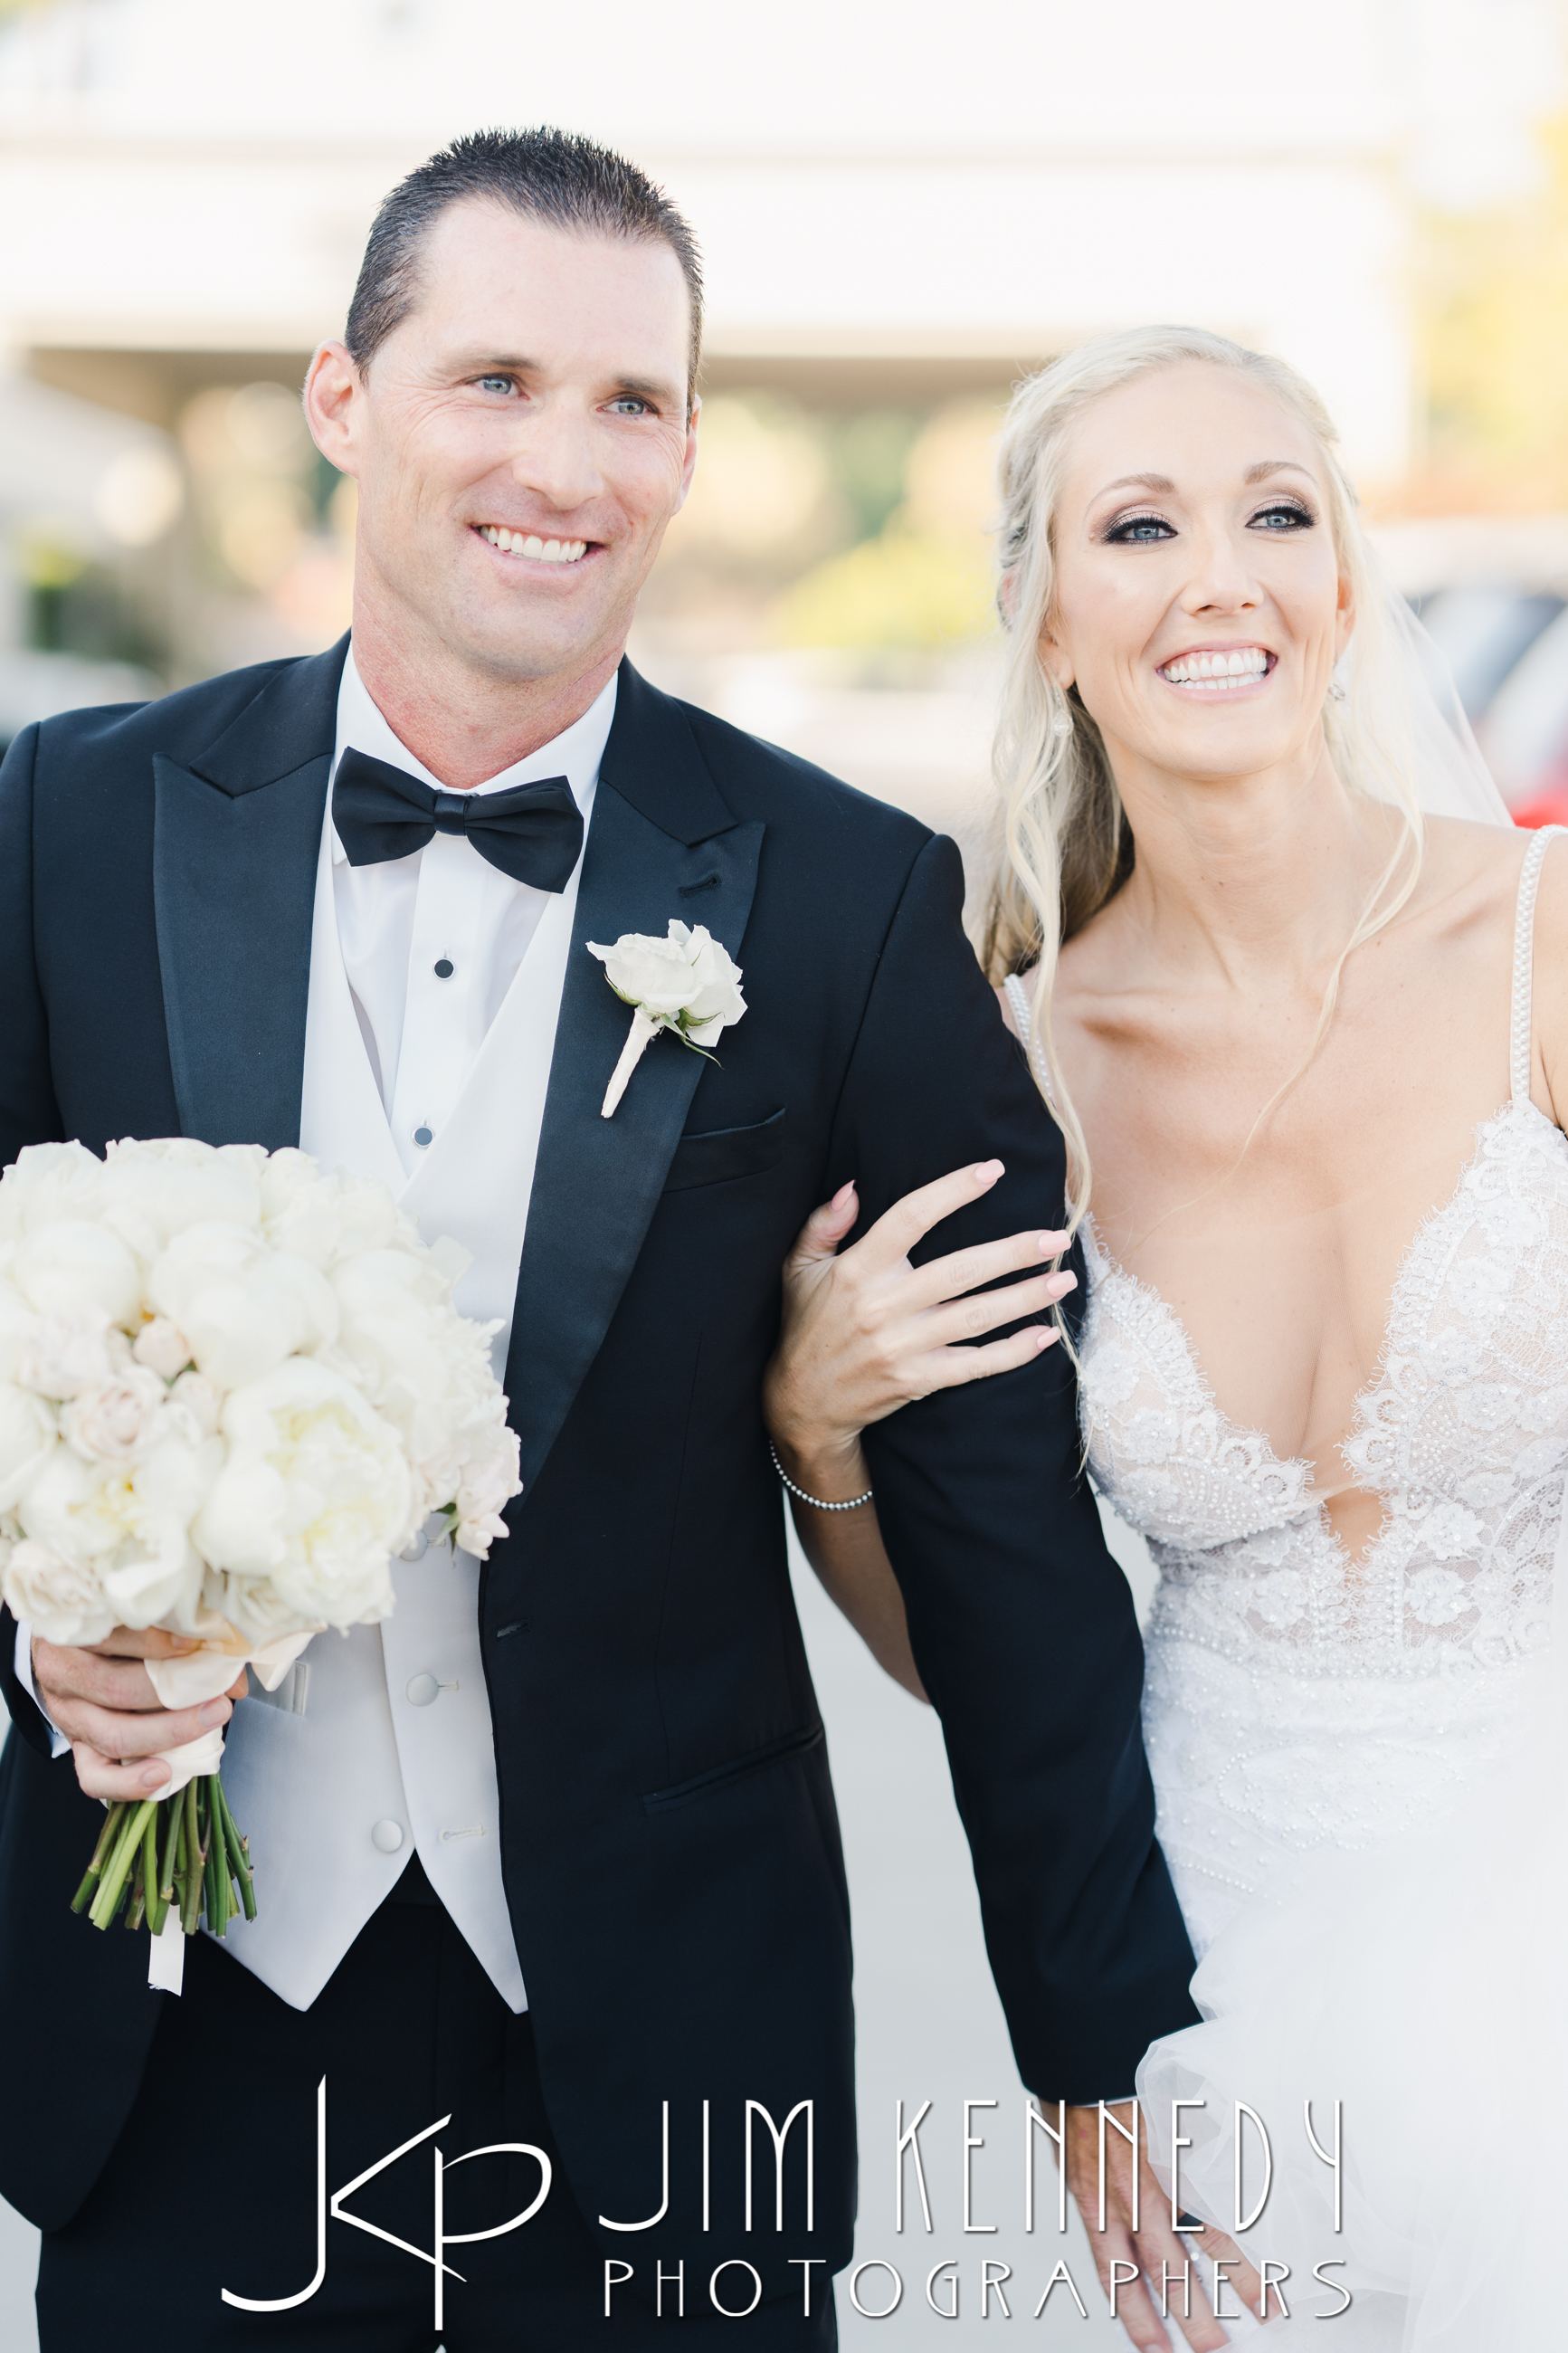 balboa-bay-resort-wedding-brooke-kevin_0115.JPG